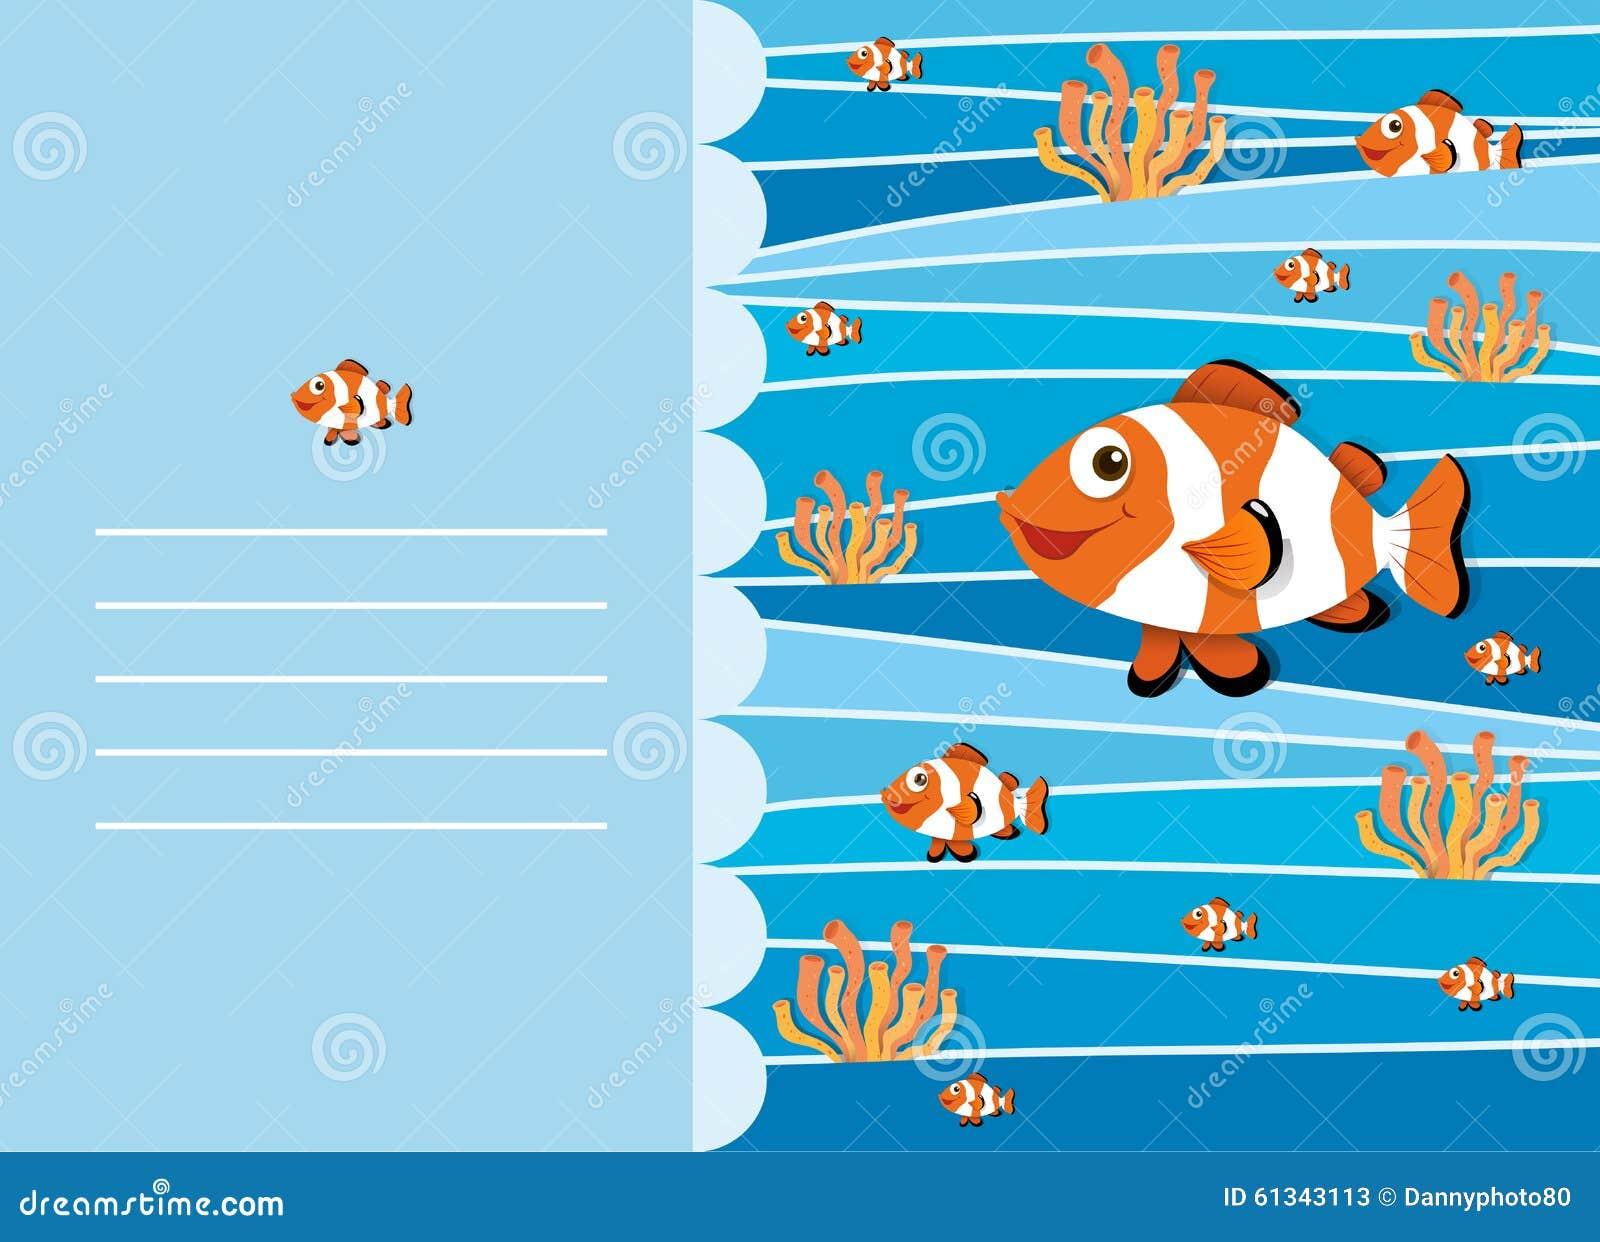 clown fish essay Speciesamphiprion polymnusbrownsaddle clownfish speciesamphiprion  rubrocinctusredgirdled anemonefish speciesamphiprion sandaracinosorange .